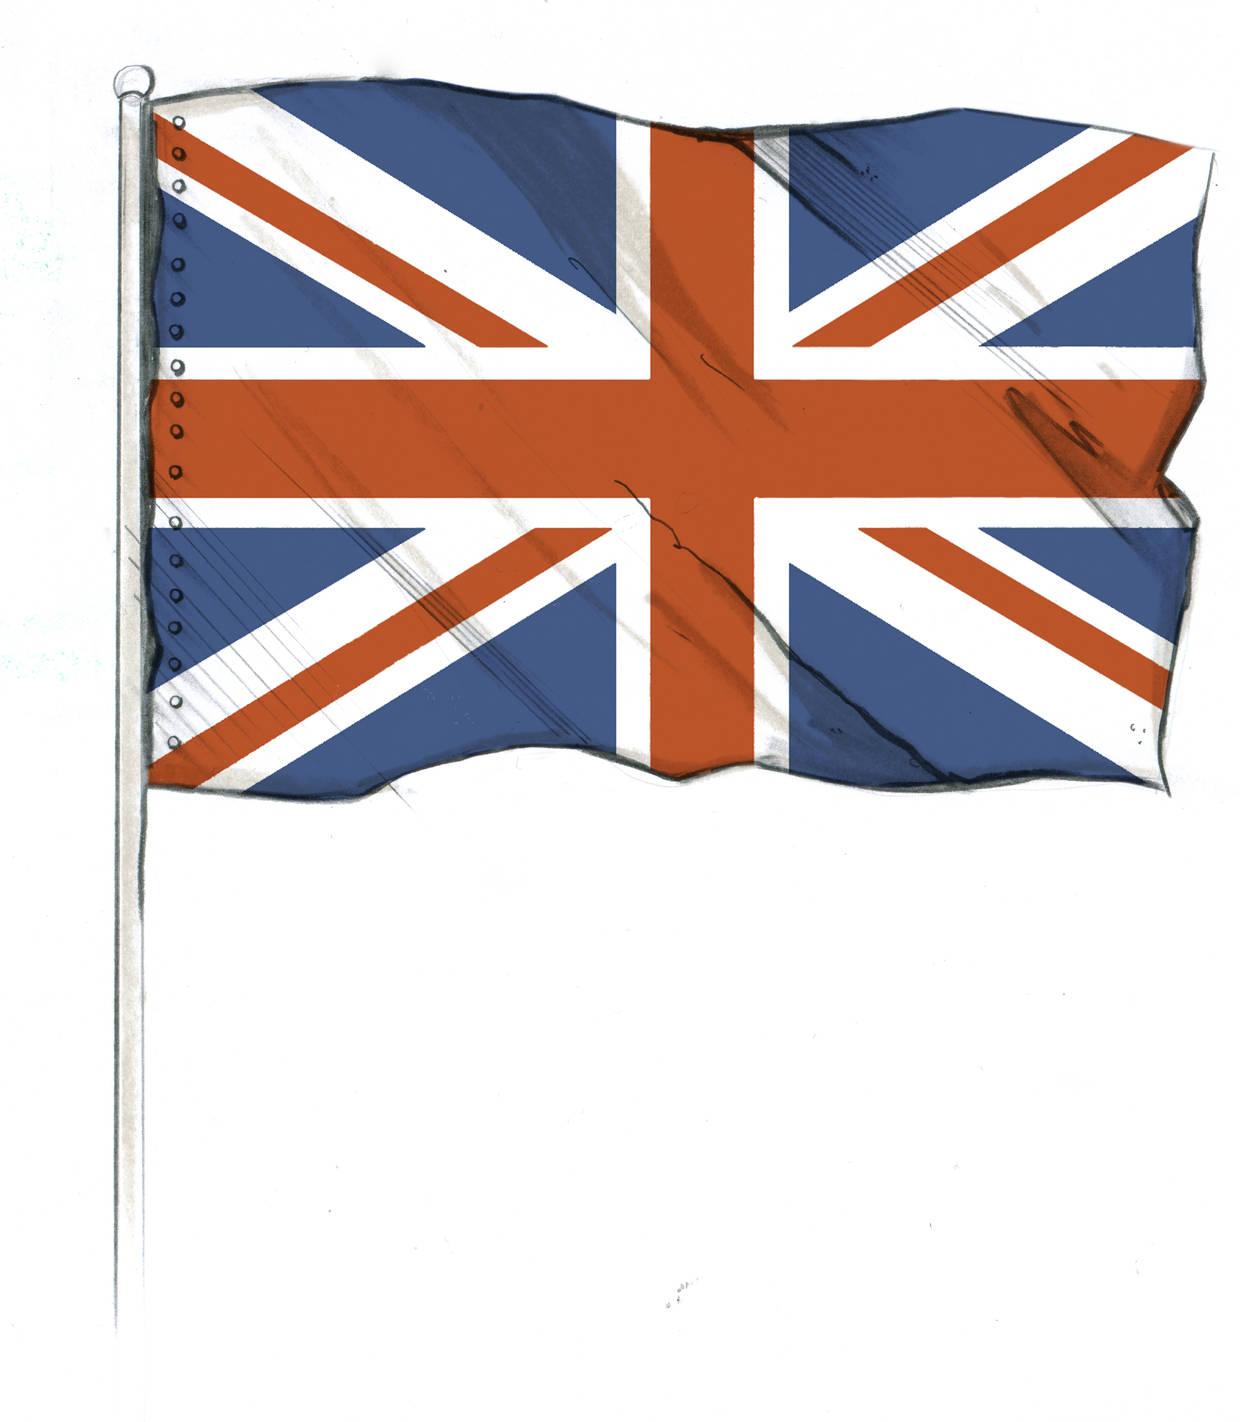 Englandfahne.jpg